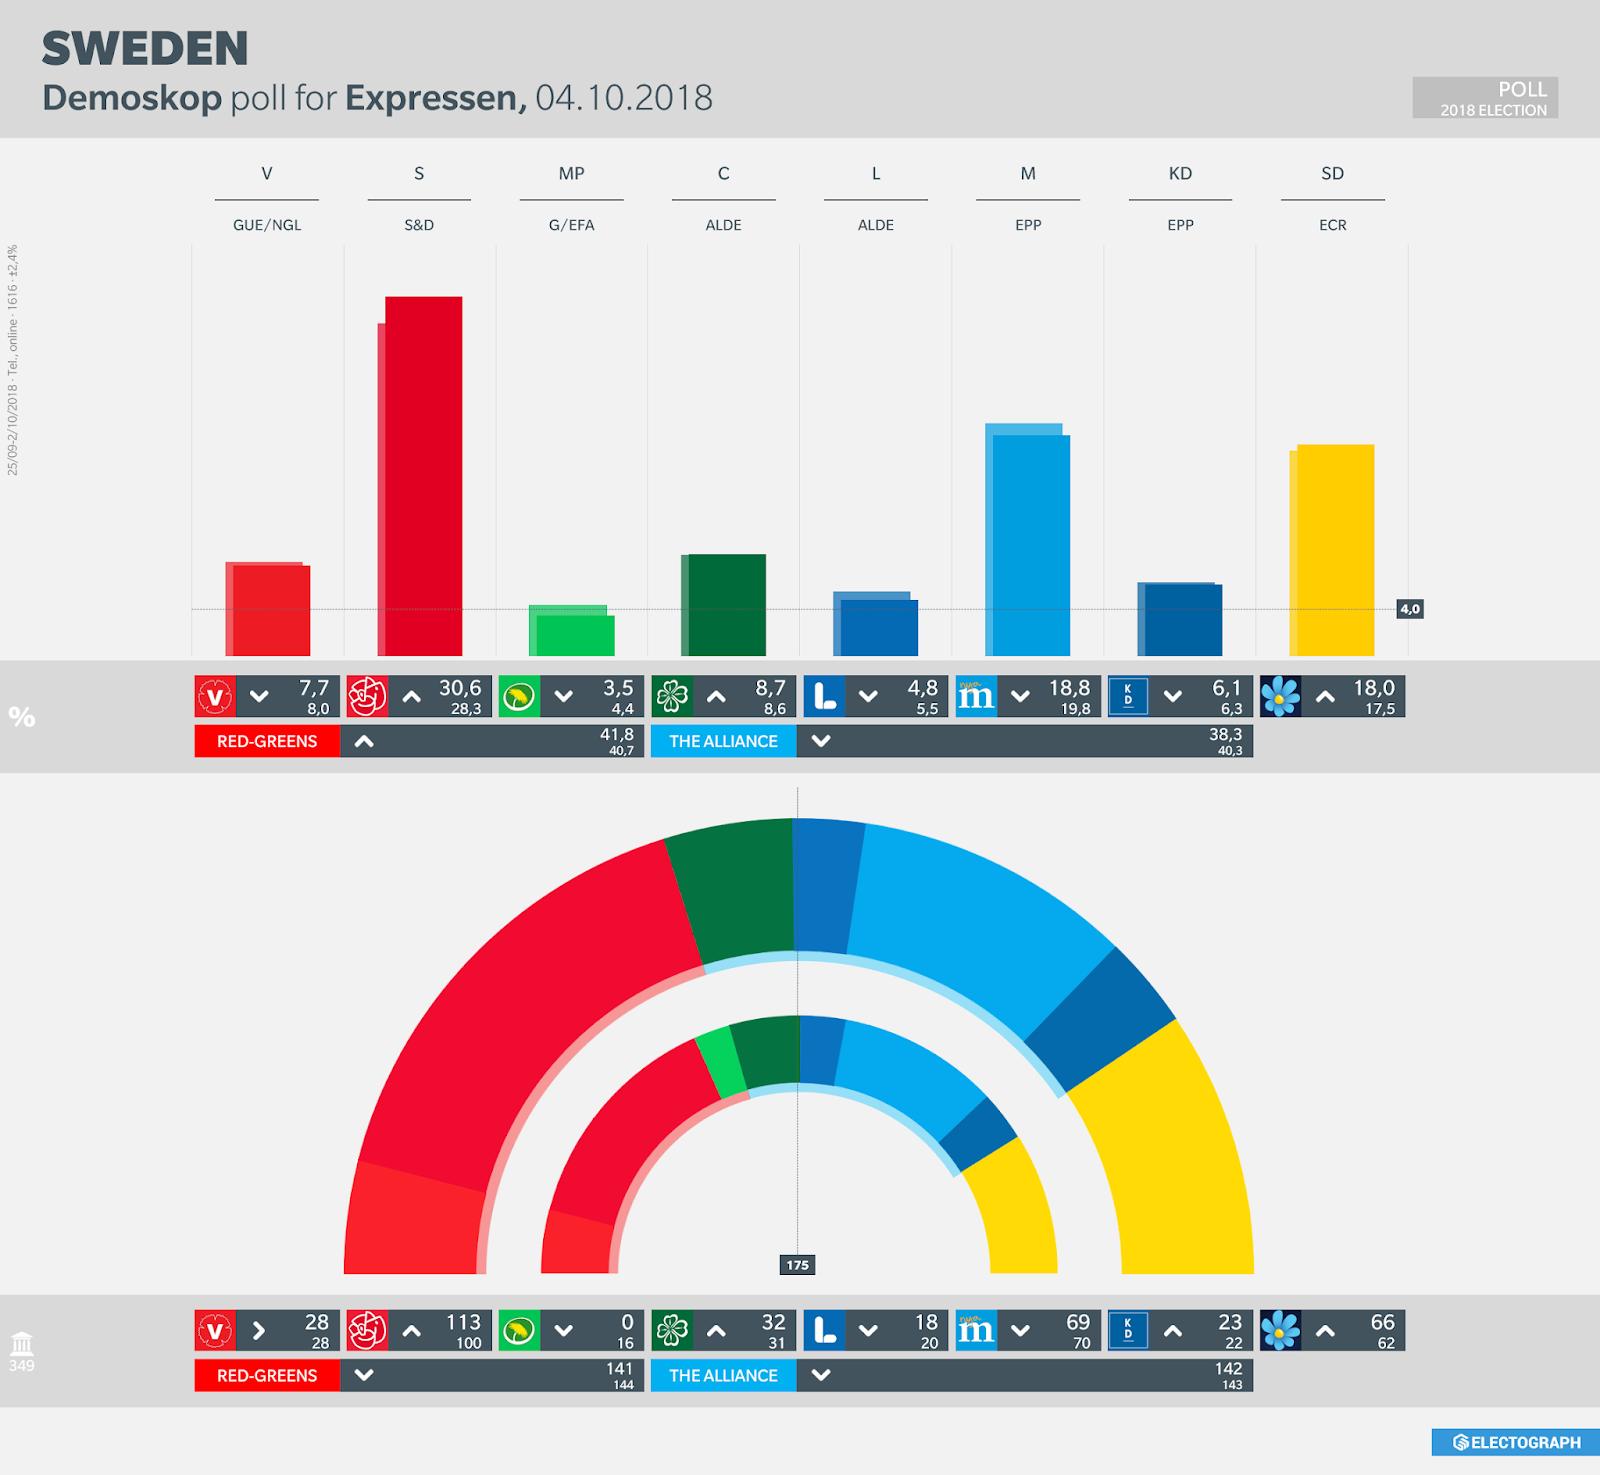 SWEDEN: Demoskop poll chart for Expressen, October 2018